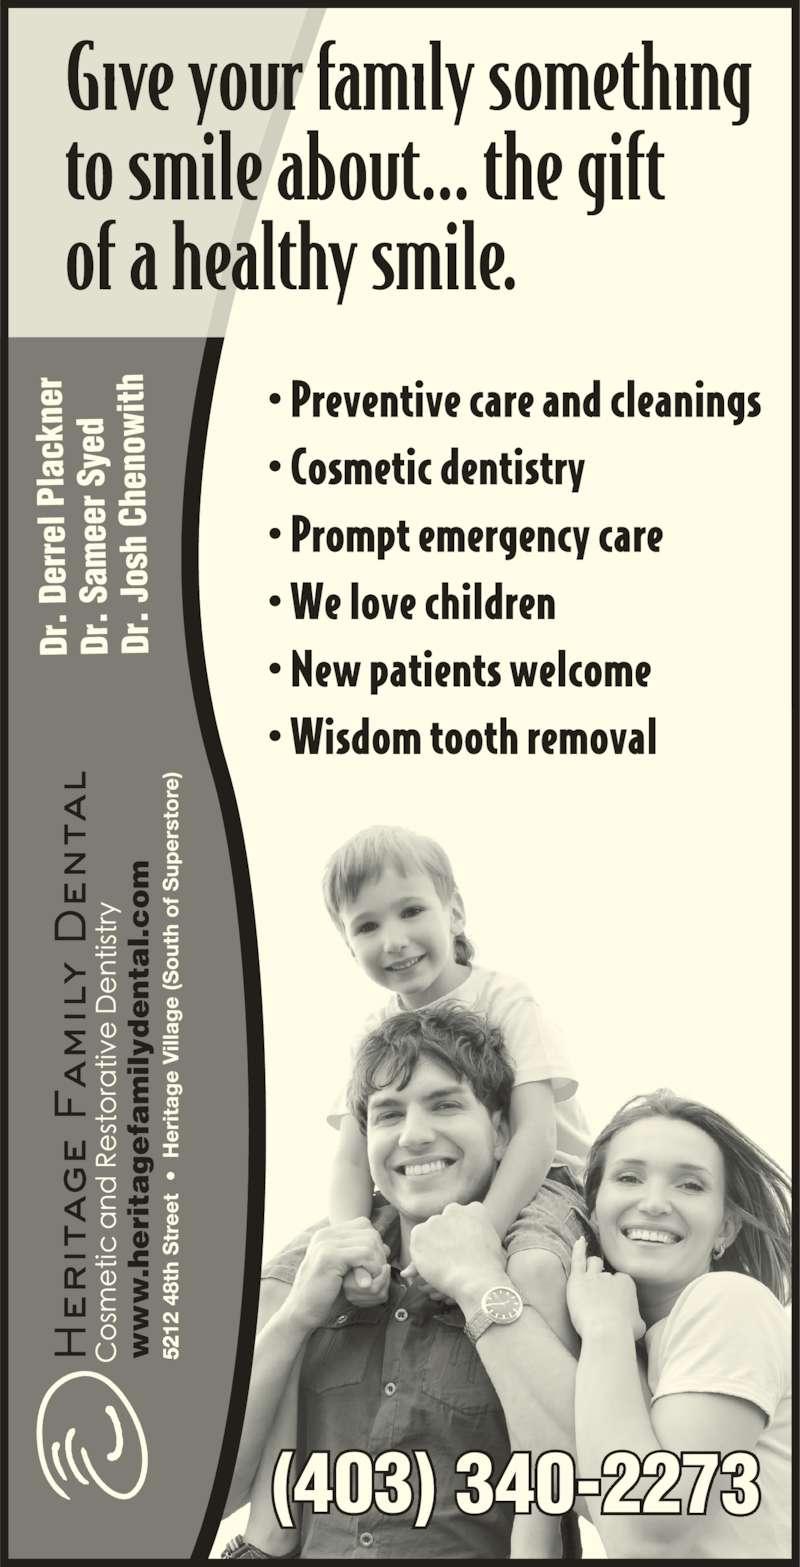 Heritage Family Dental (403-340-2273) - Display Ad - (403) 340-2273 .h ri ta fa il yd ta l. .h ri ta fa il yd ta l.